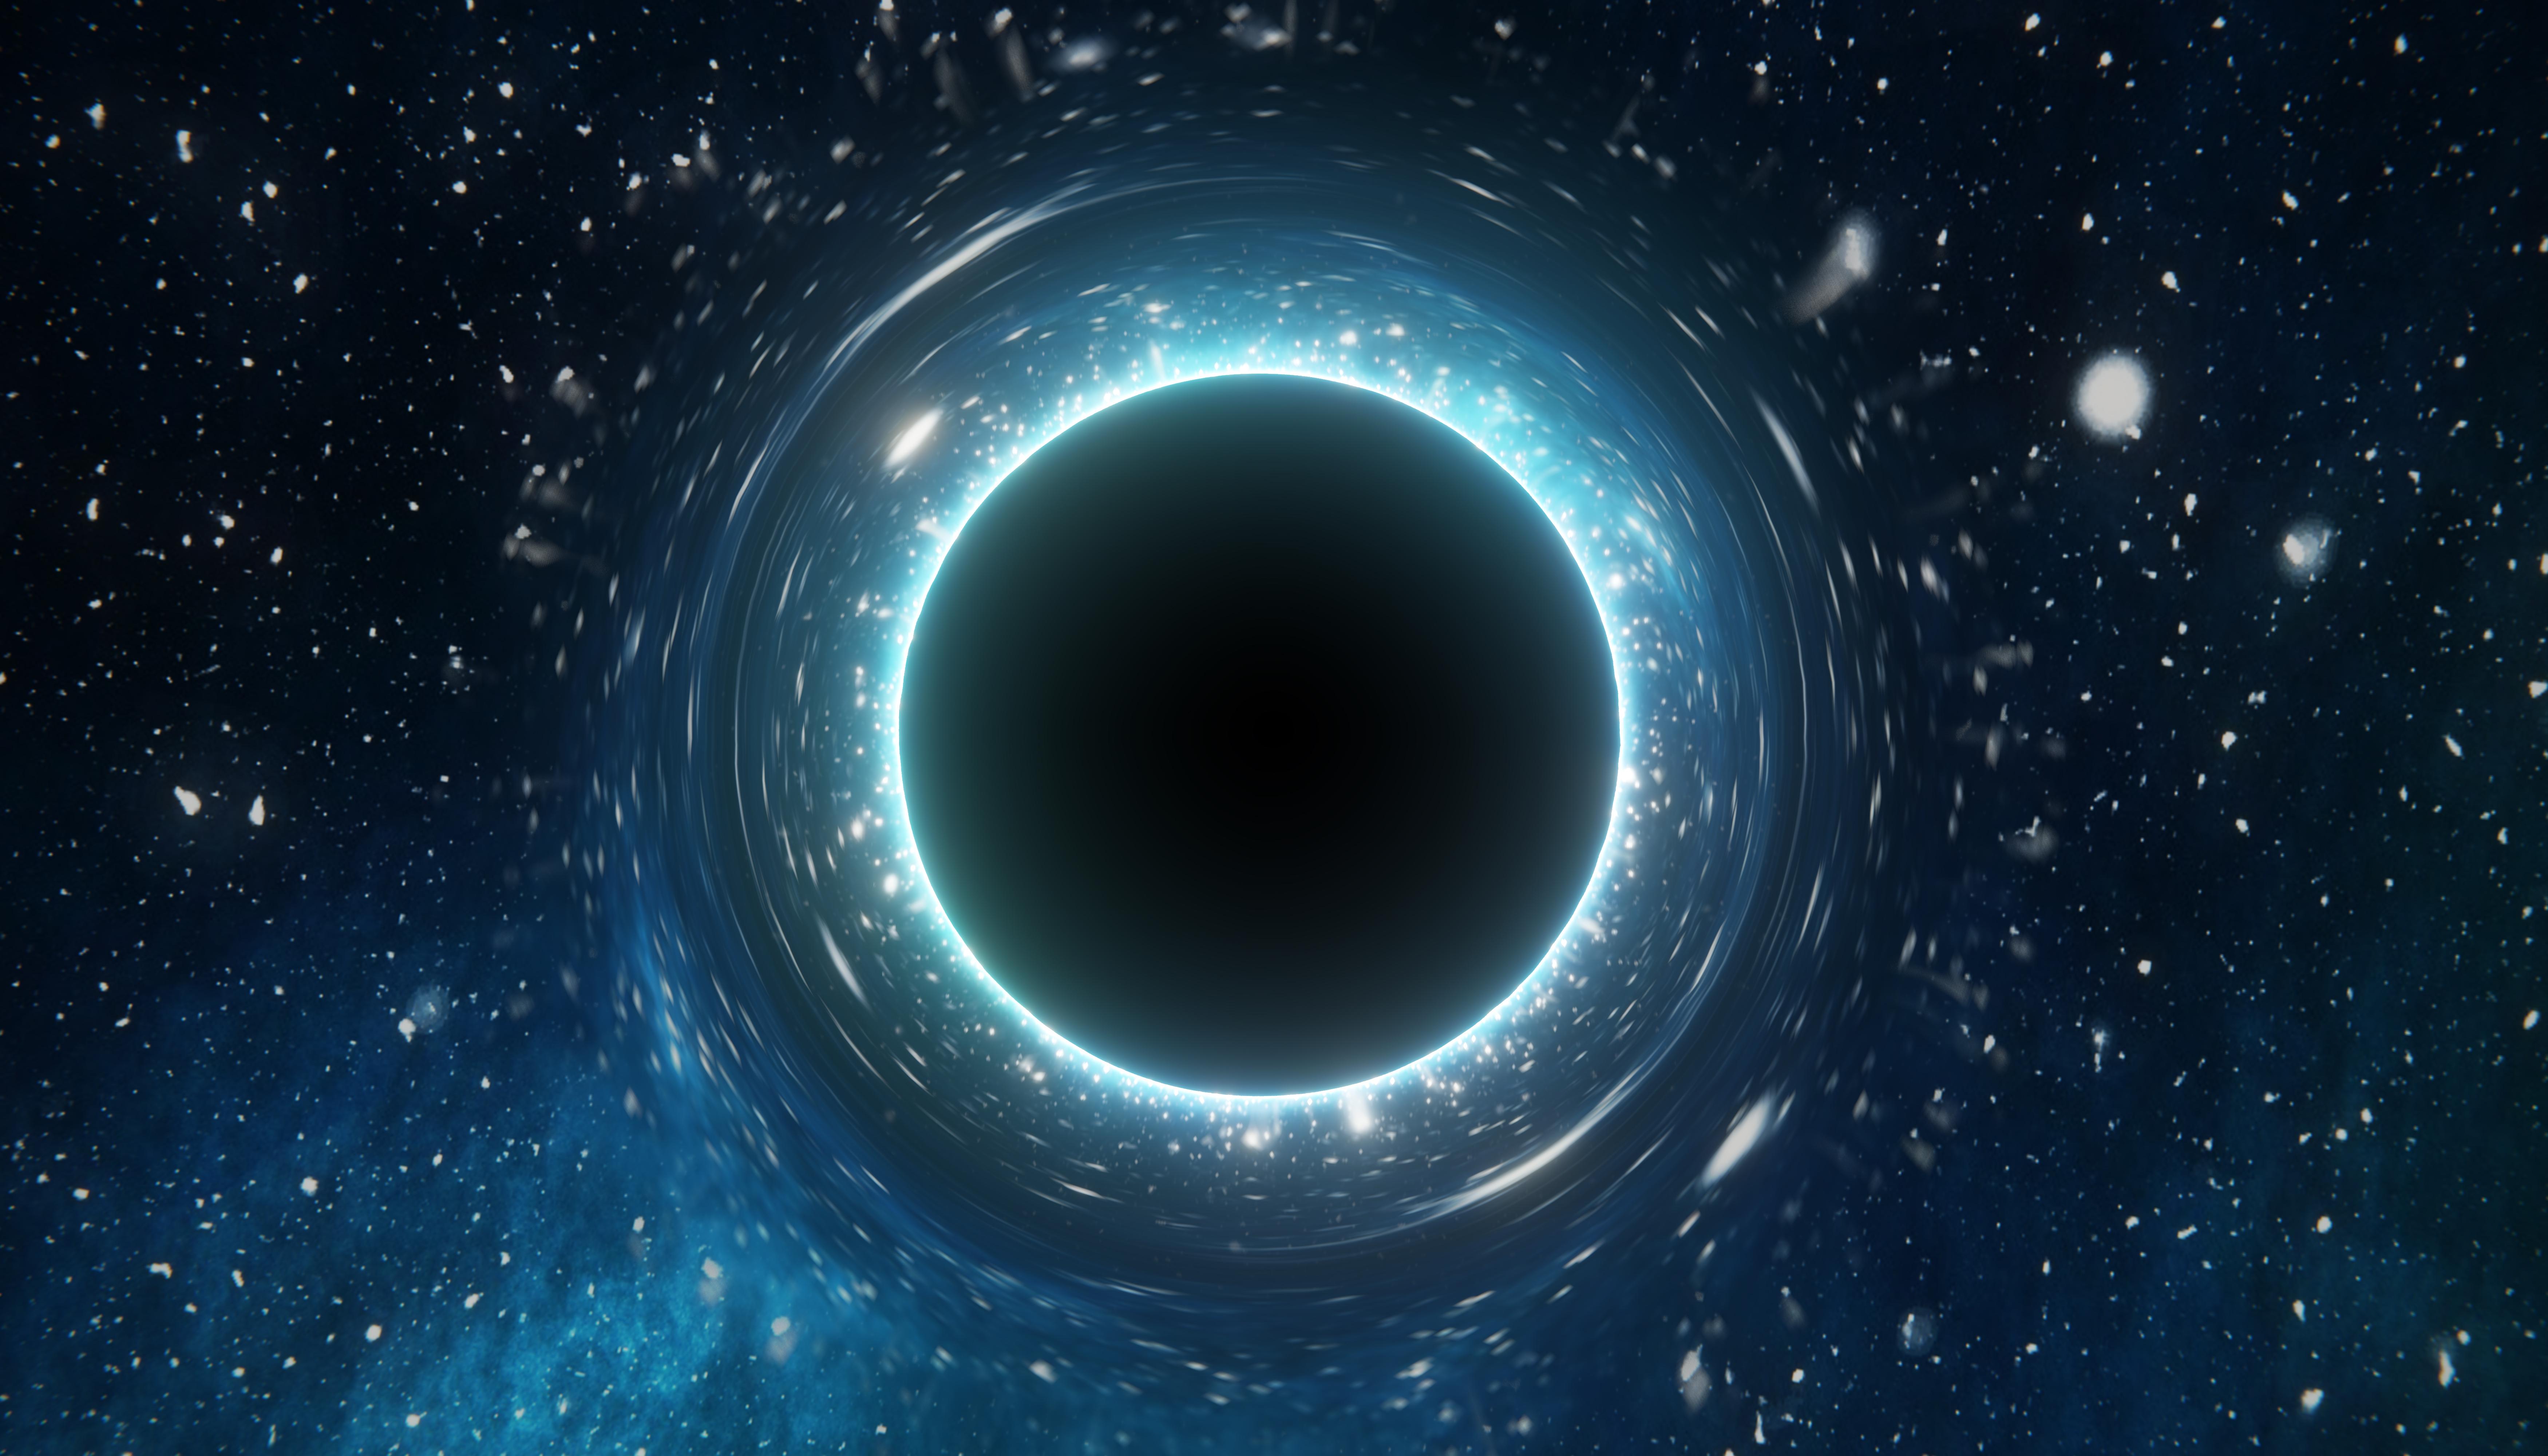 Singularity of massive black hole. 3D rendered illustration.